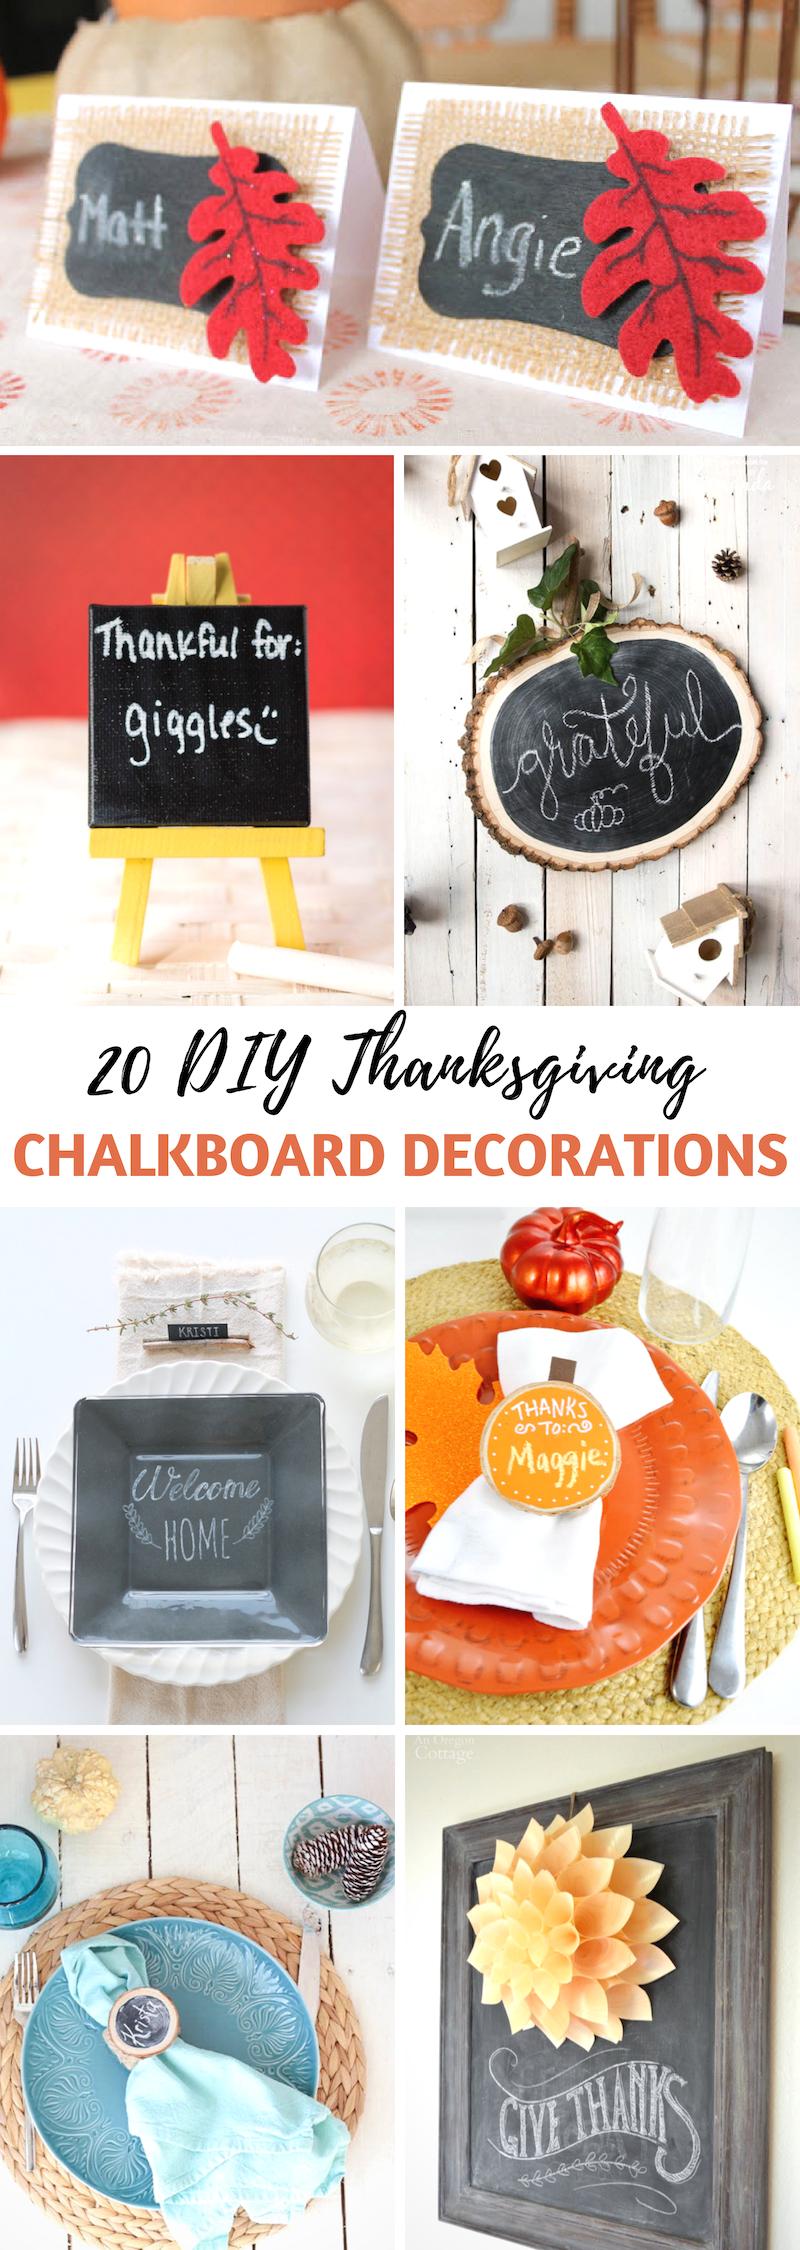 DIY Thanksgiving Chalkboard Decorations